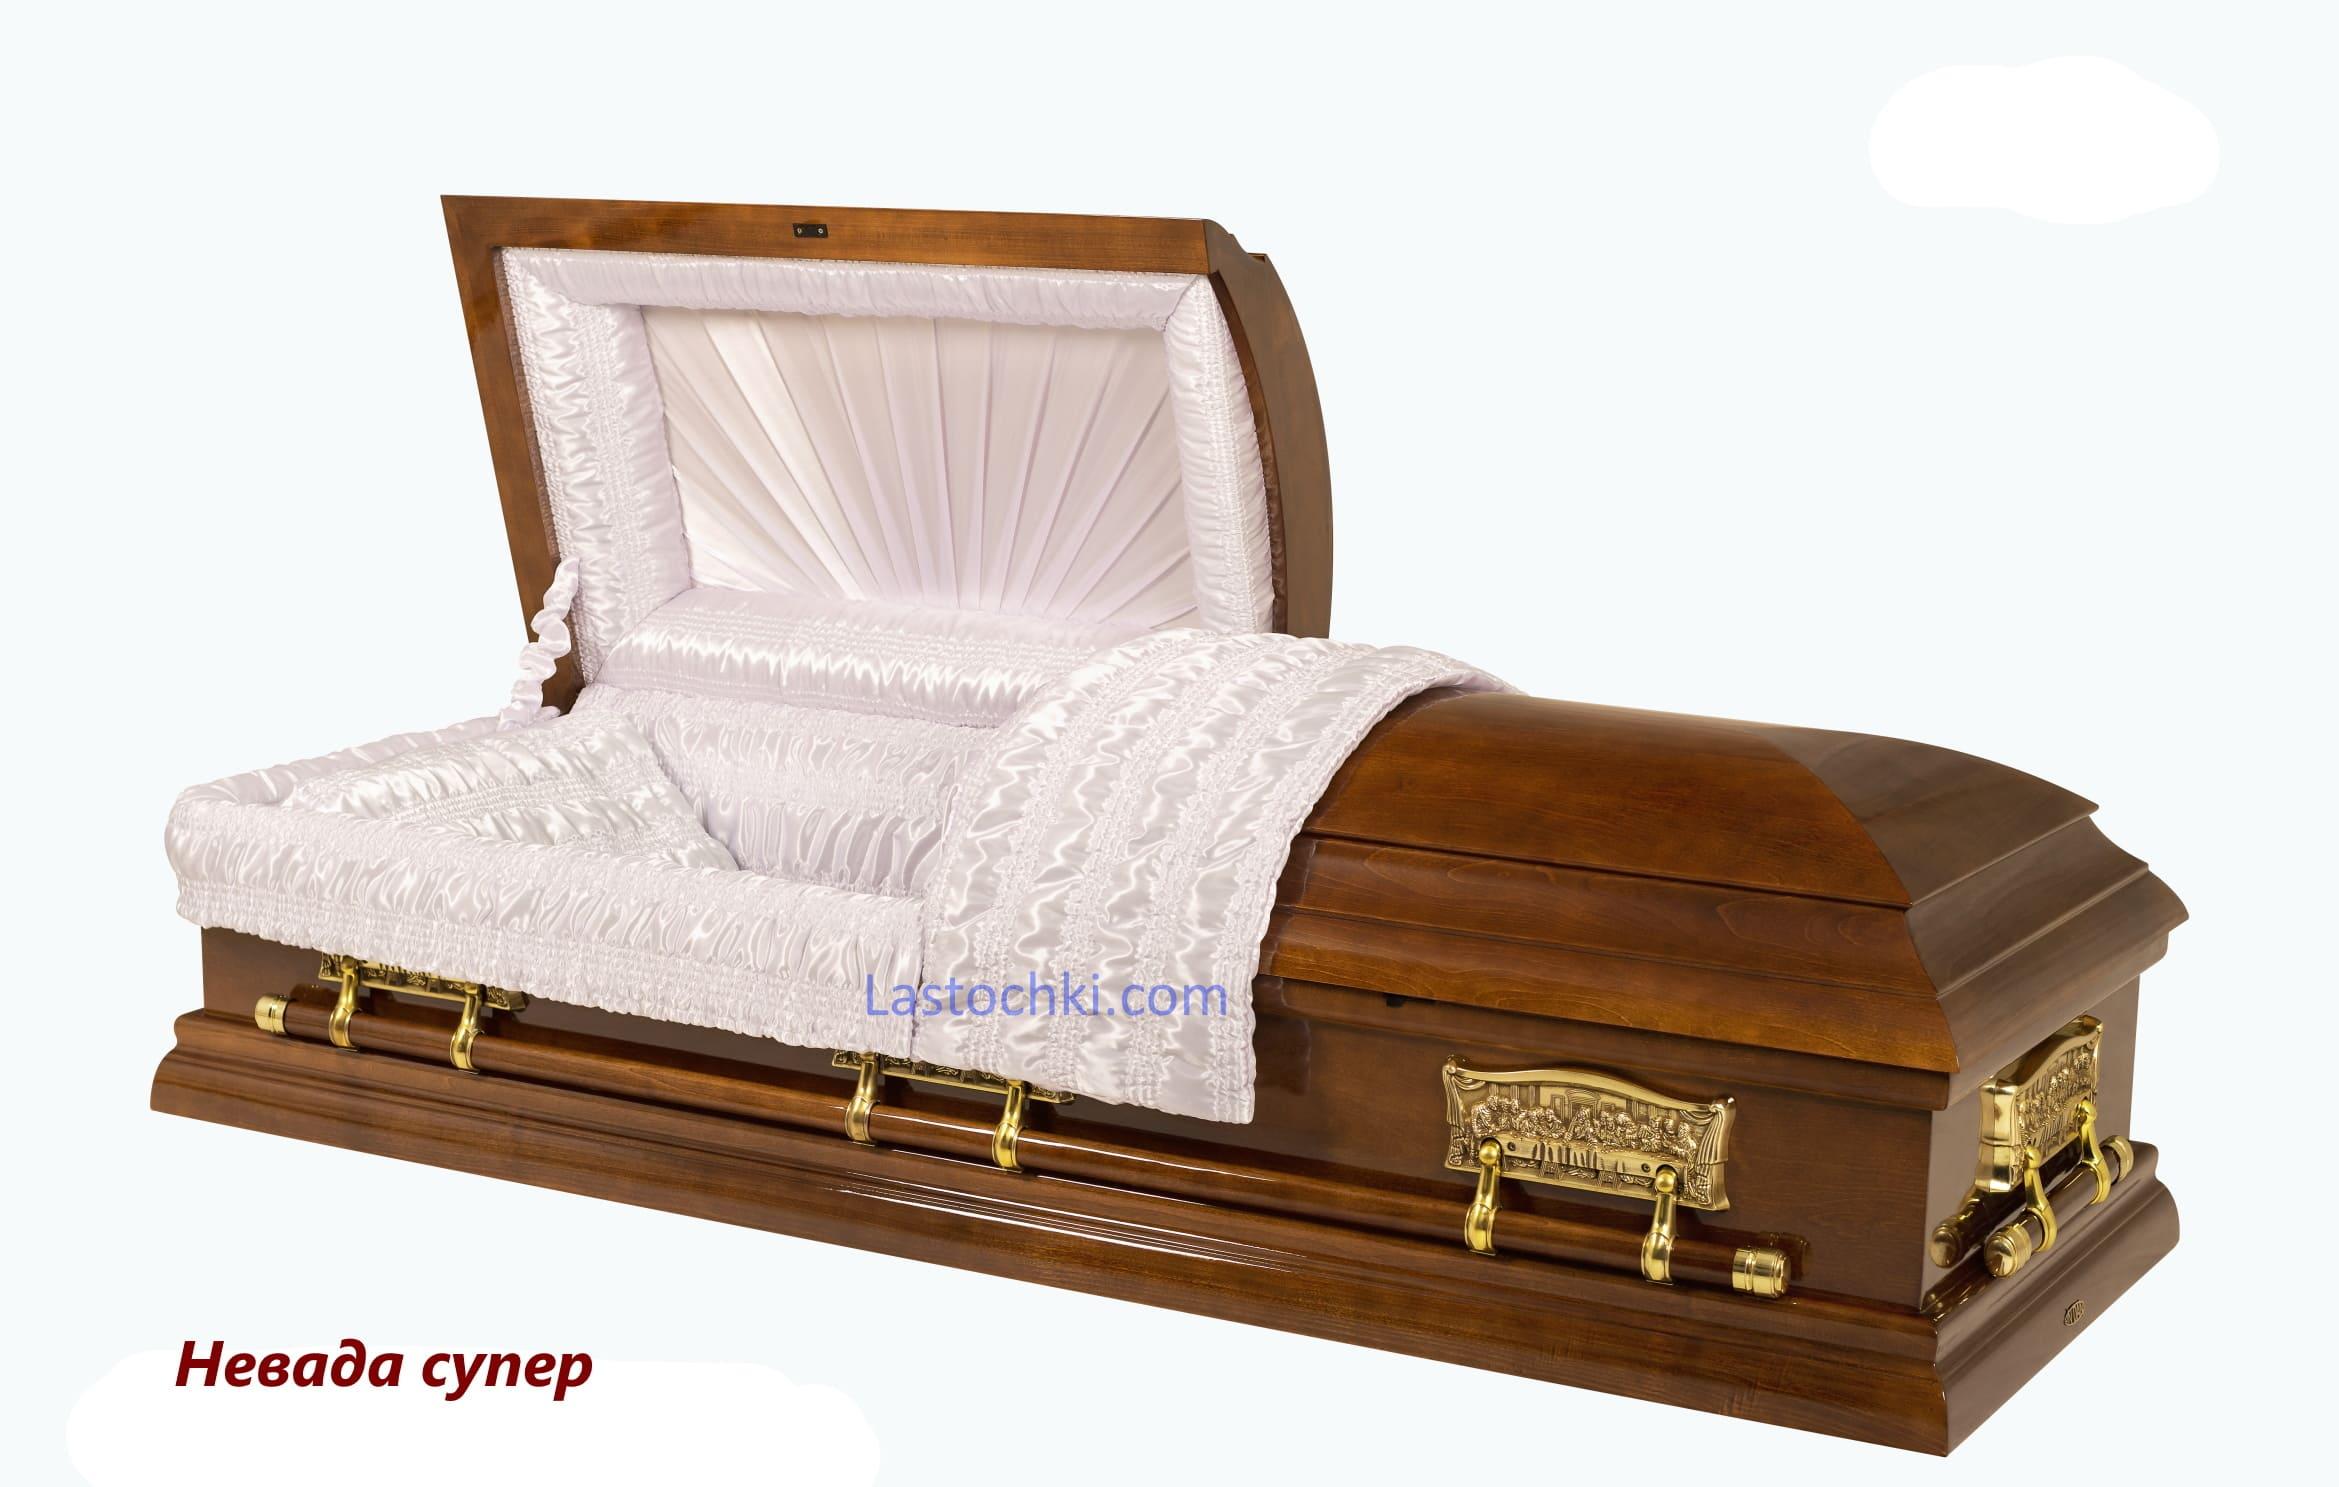 Саркофаг Невада супер  -  Цена 50 000 грн.